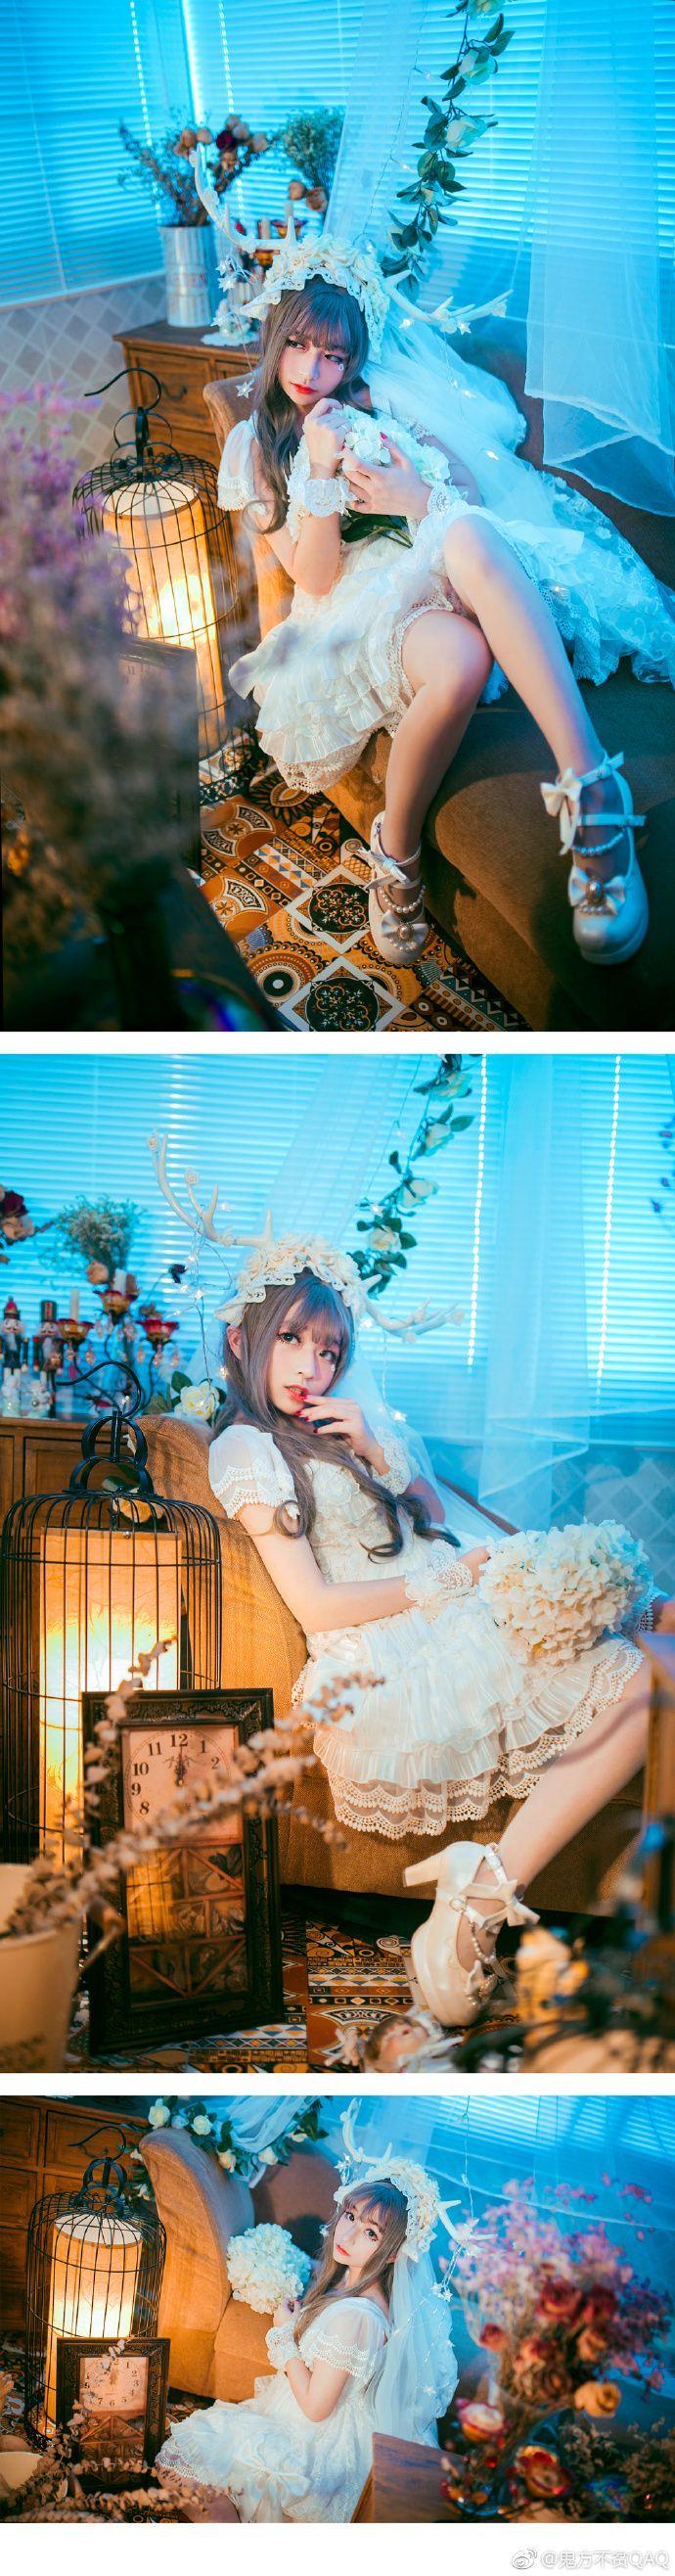 来只妖孽 's Weibo_Weibo